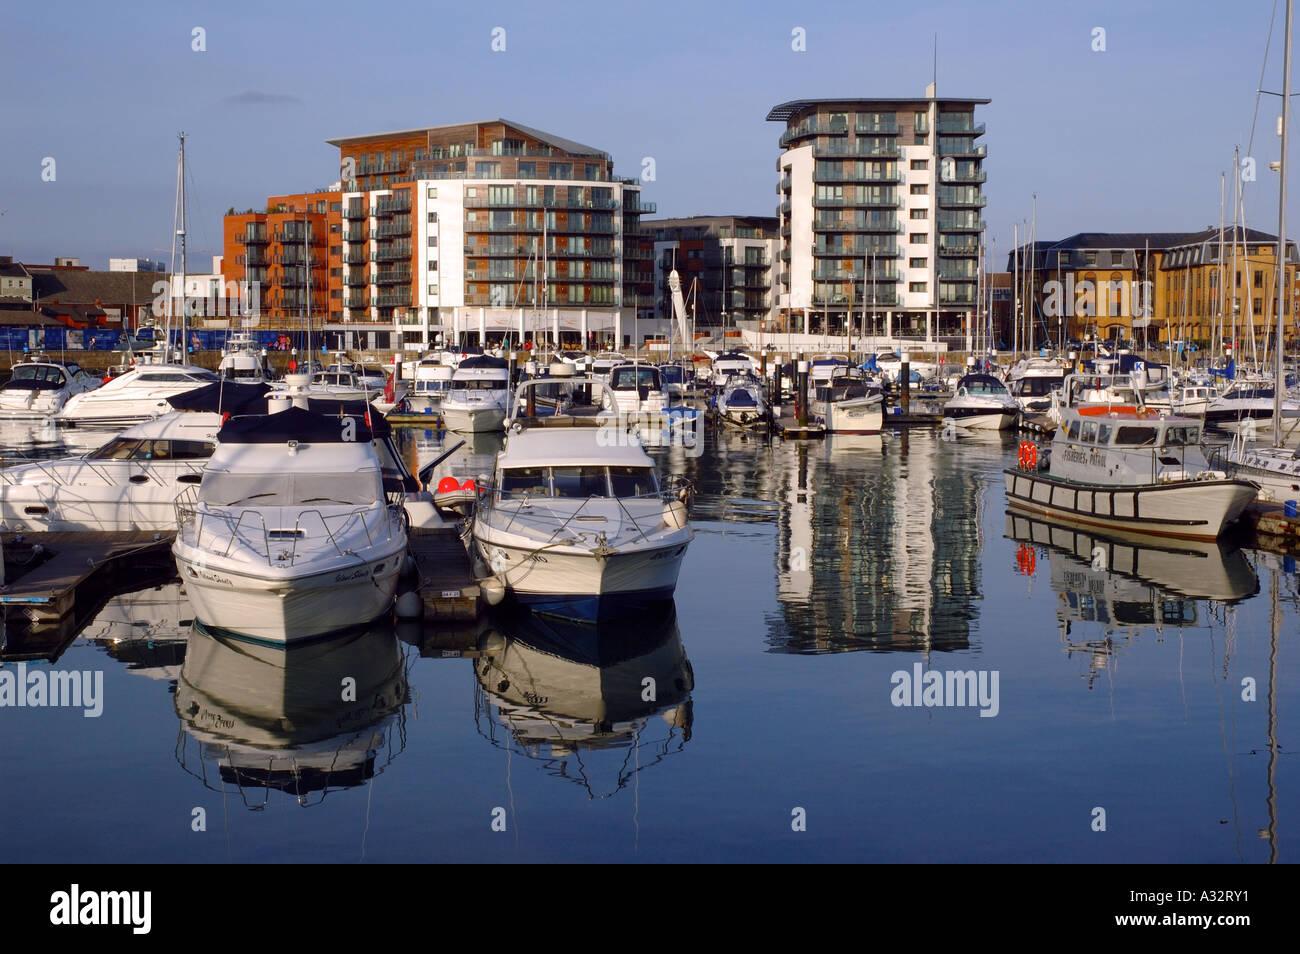 Ocean Village Marina, Southampton, Hampshire, England, UK, GB. - Stock Image